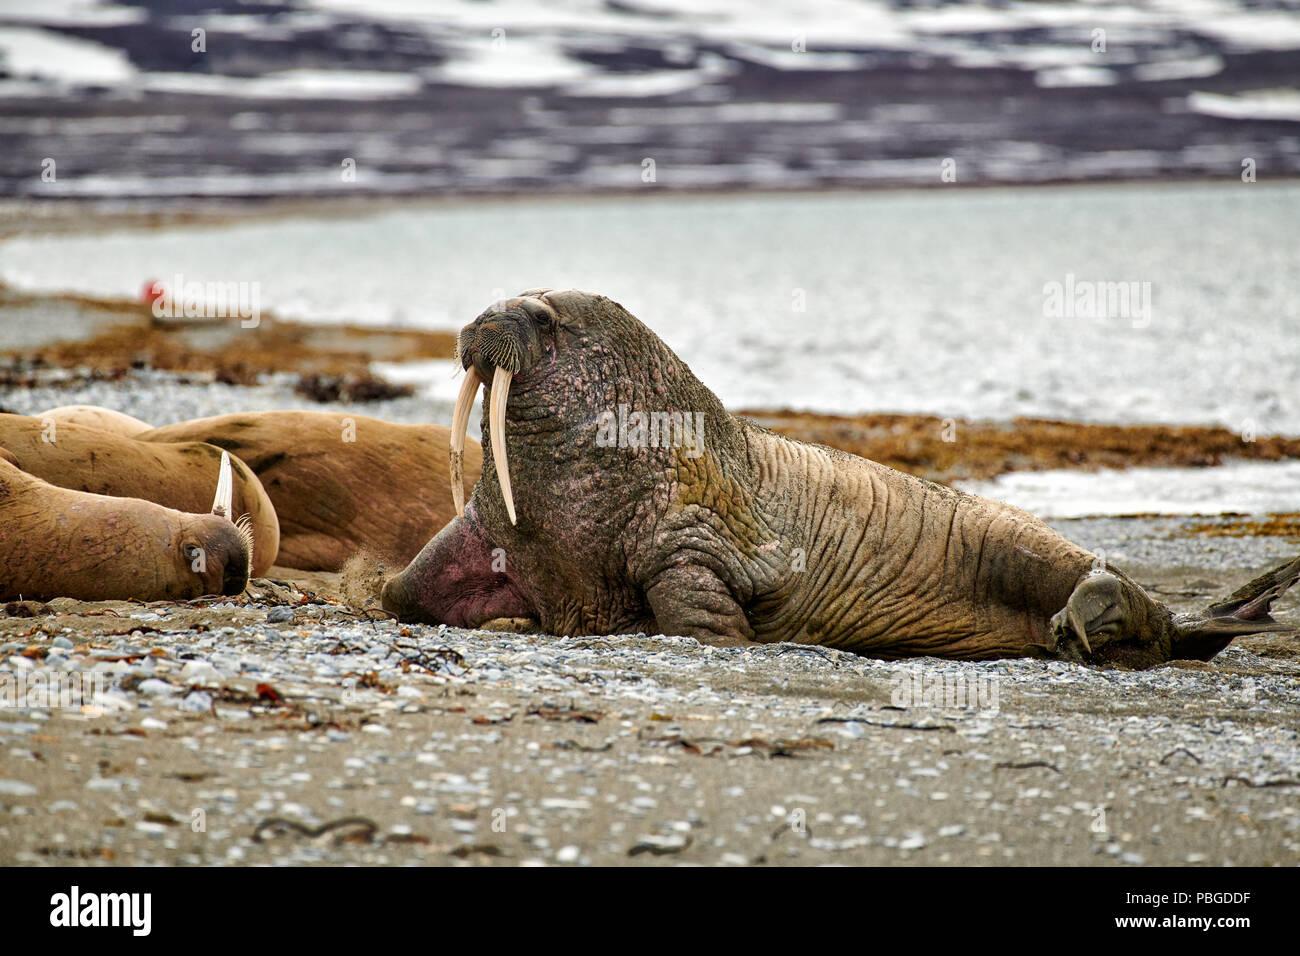 Le morse (Odobenus rosmarus), Poolepynten, Svalbard, Spitzberg ou l'Europe Photo Stock